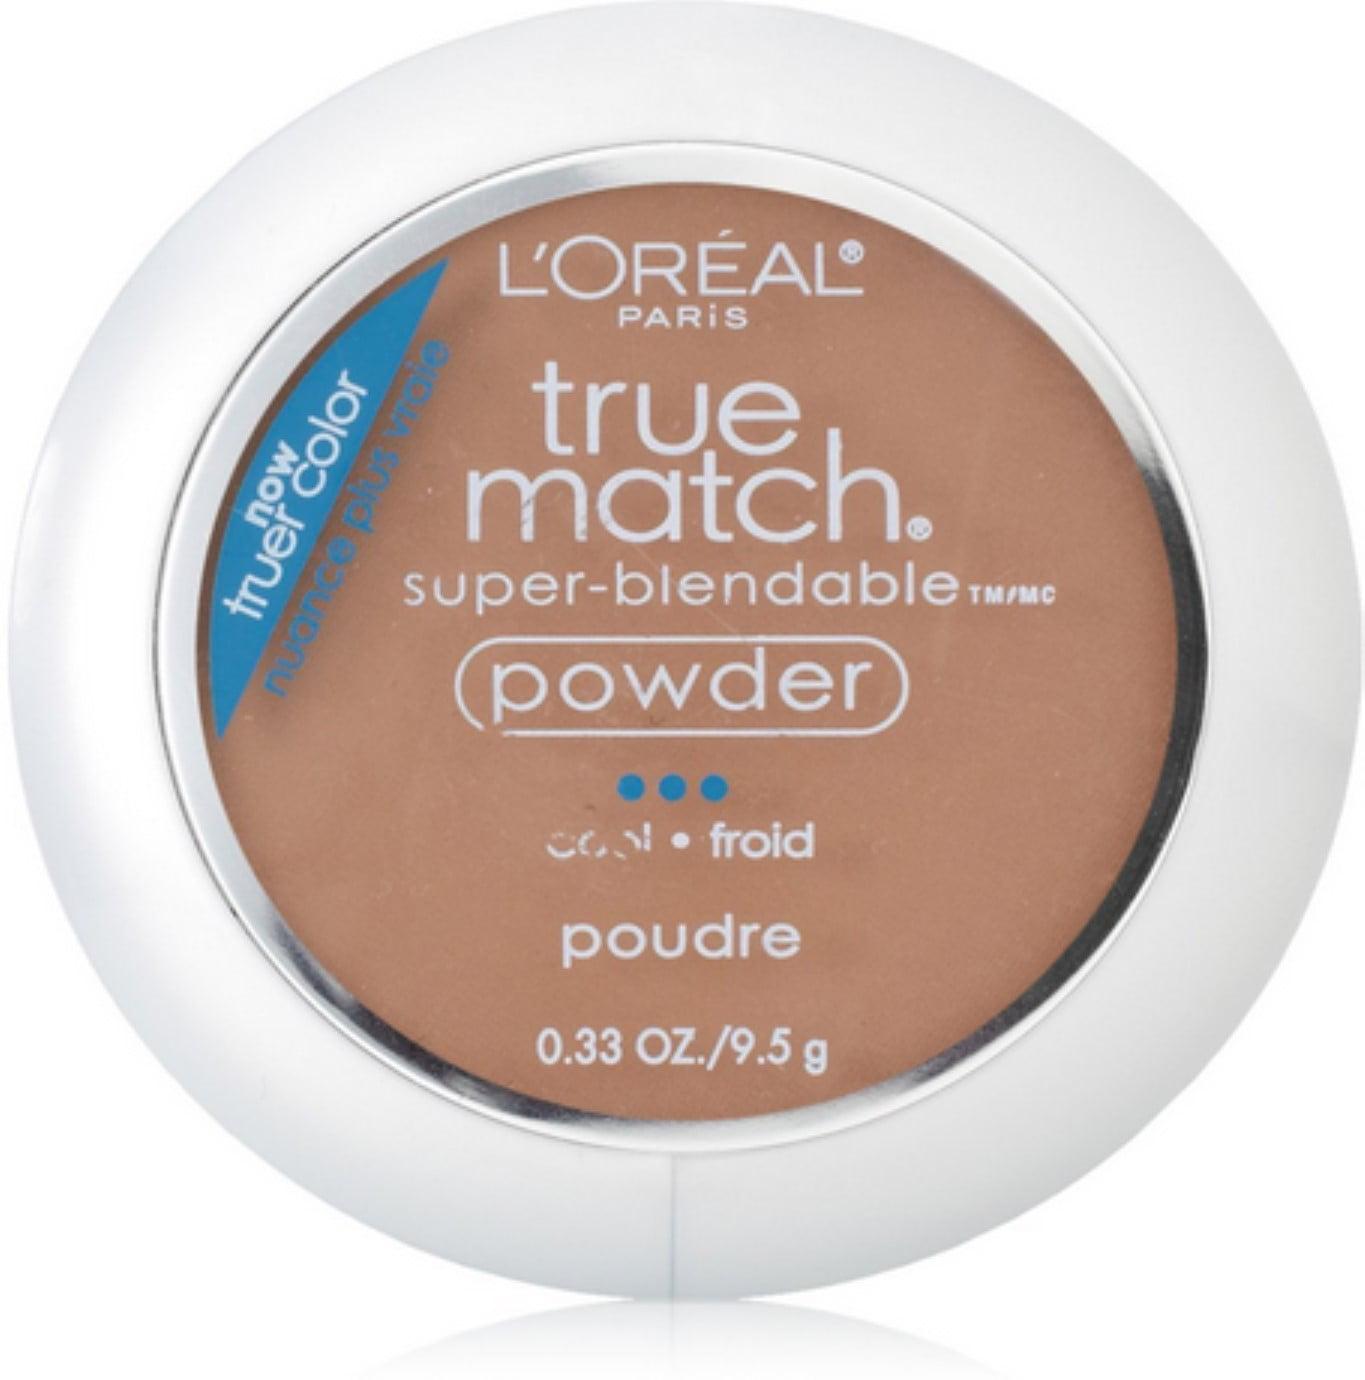 L'Oreal True Match Powder, Soft Sable [C6], 0.33 oz (Pack of 4)